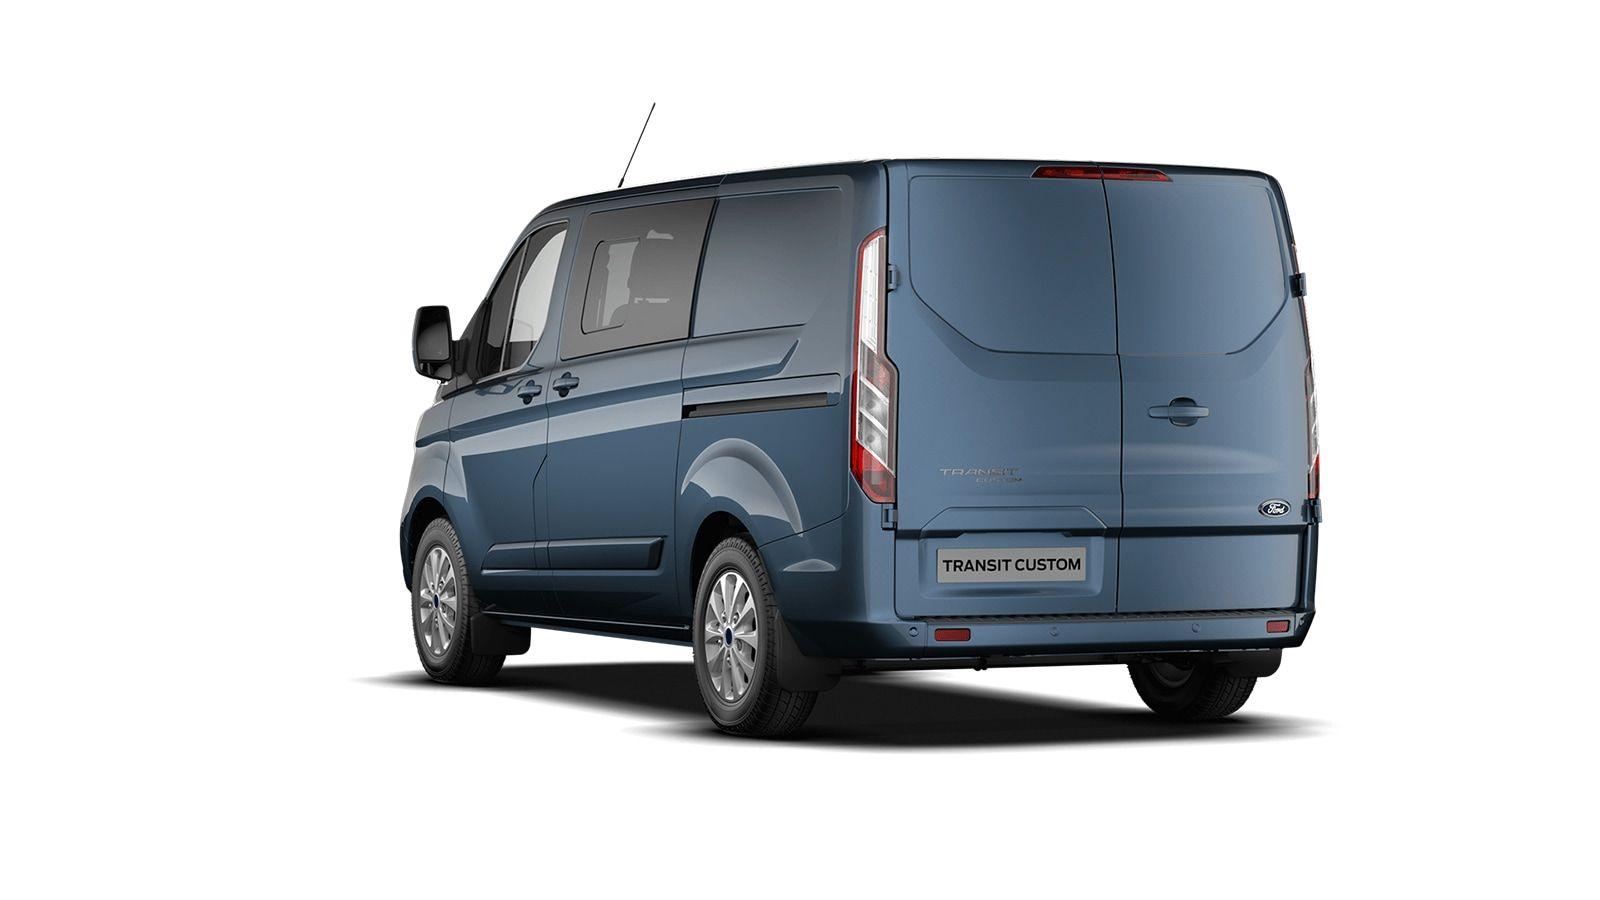 Demo Ford Transit custom 320L Multi use: bestelwagen met dubbele cabine L1 Limited MS BYB - Metaalkleur: Chrome Blue 2